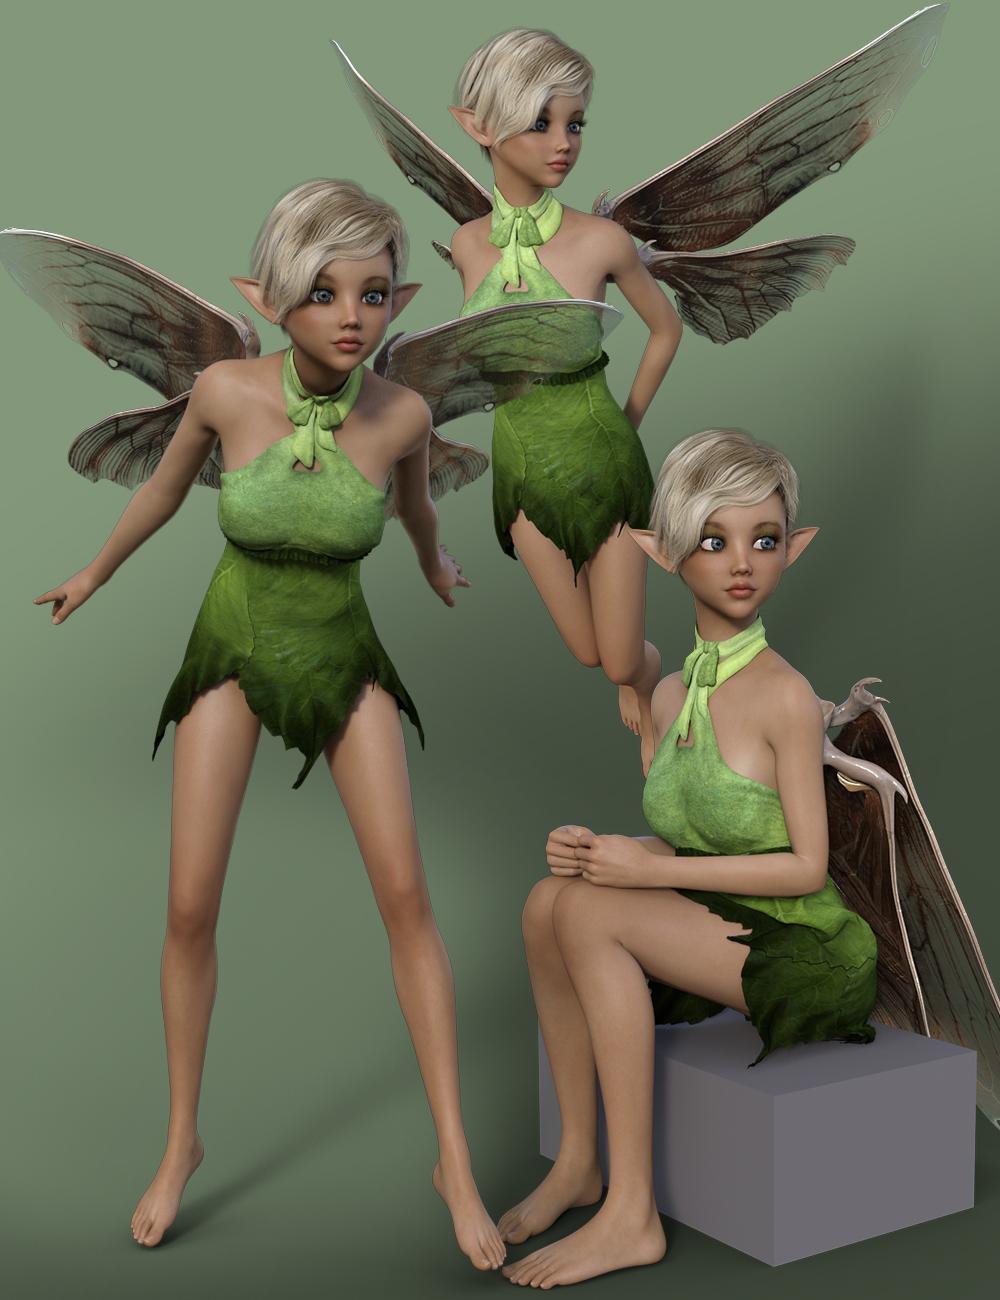 Classic Fairy Attitude Poses for Karyssa 8 by: Quixotry, 3D Models by Daz 3D